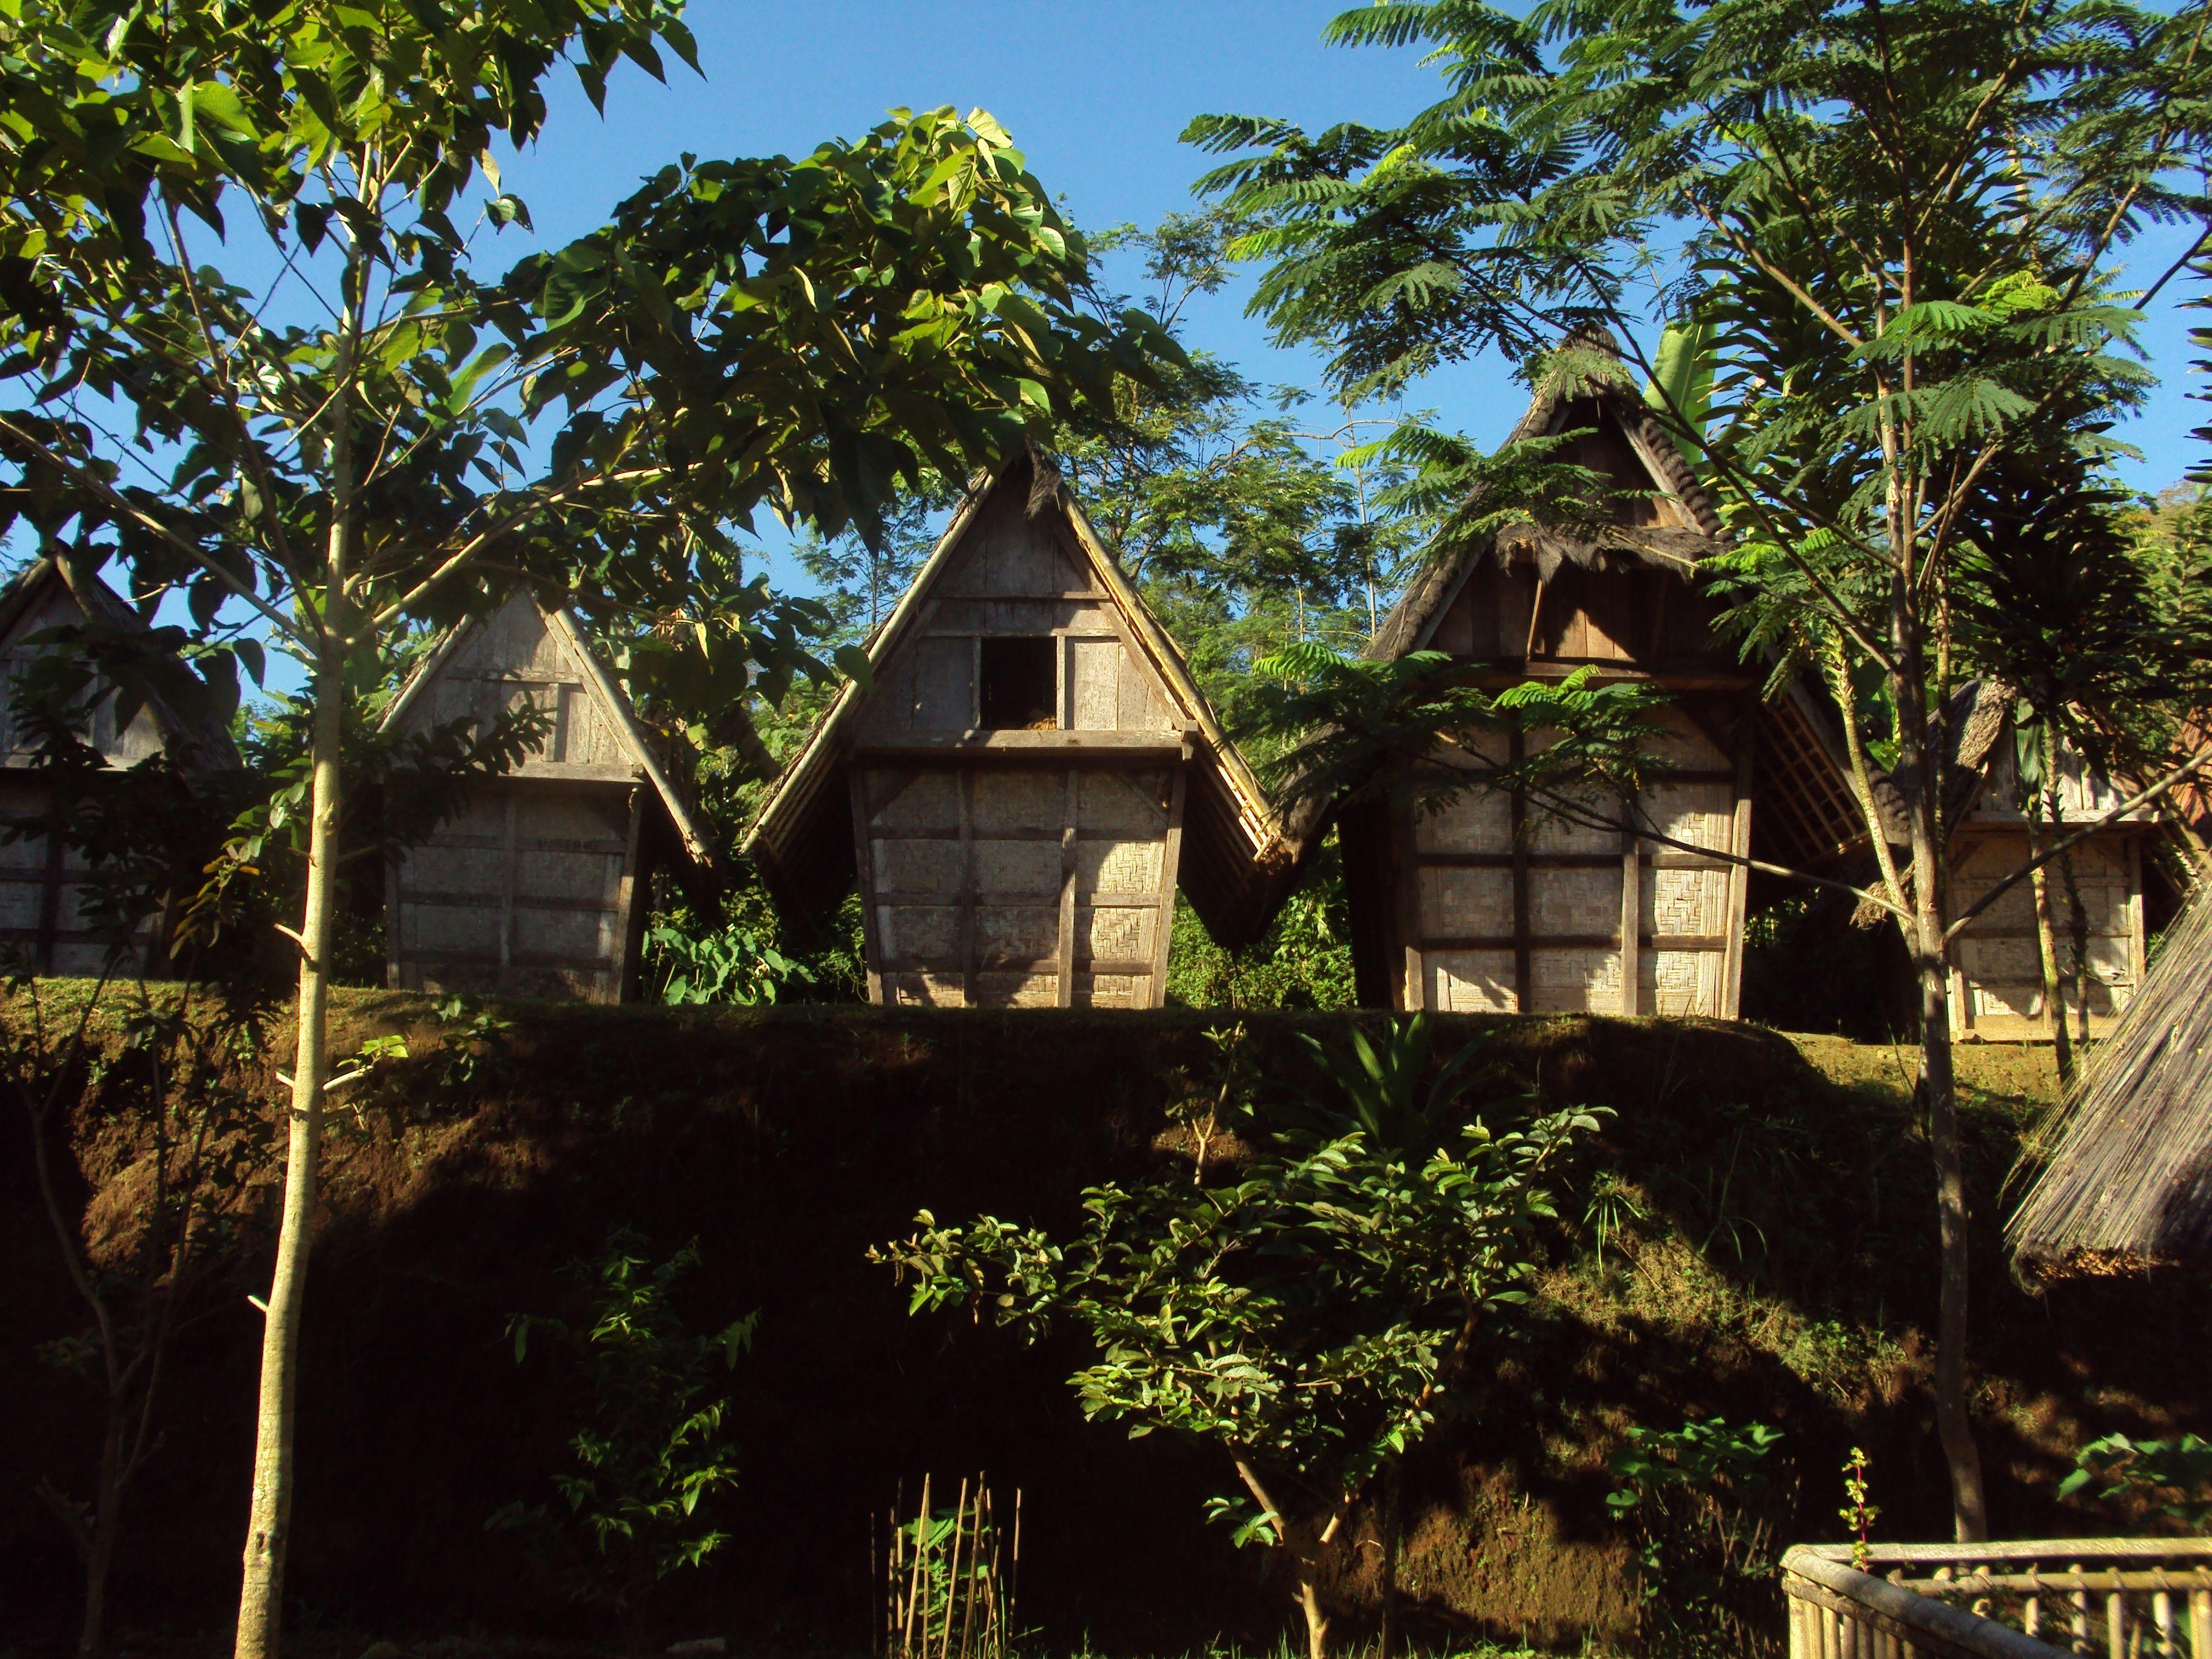 Rumah Adat Melayu Riau